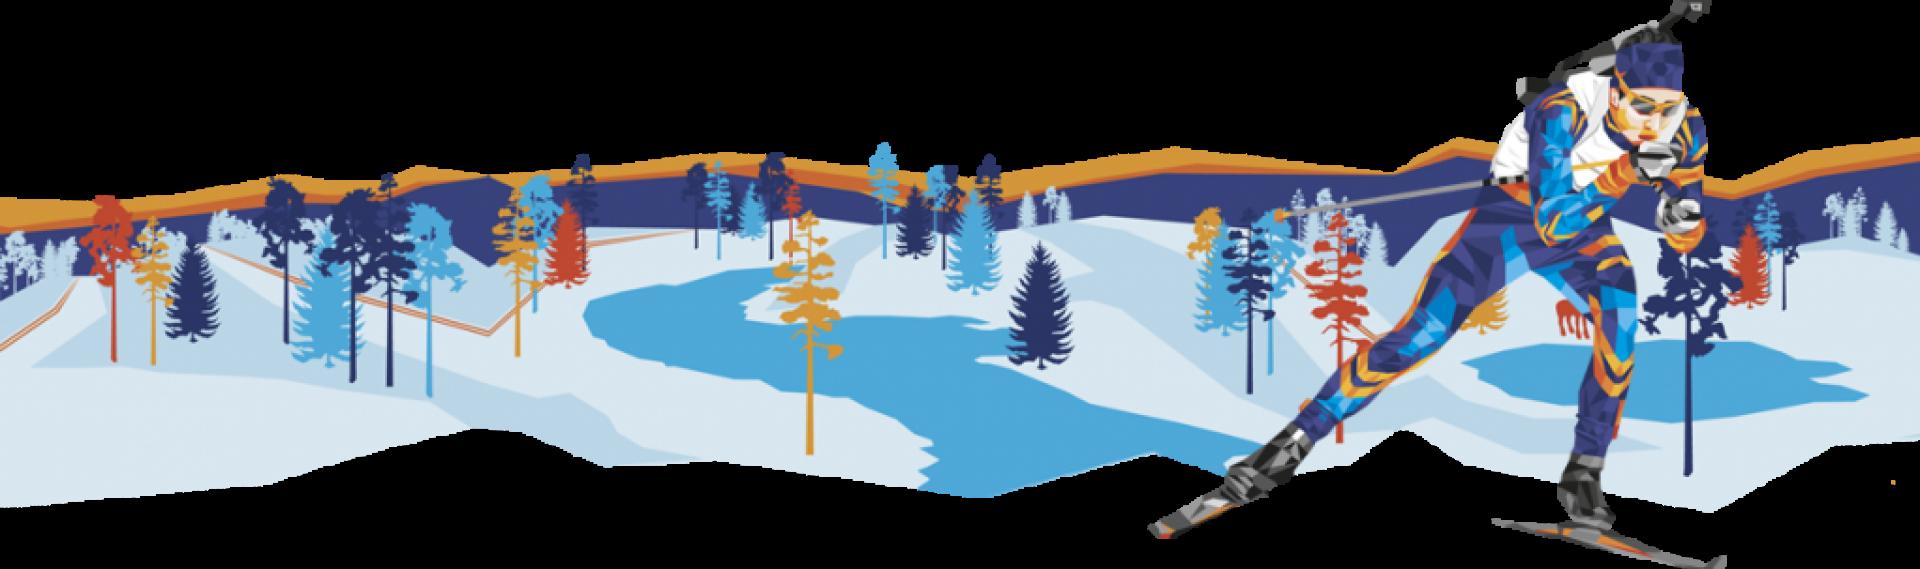 biathlon-png